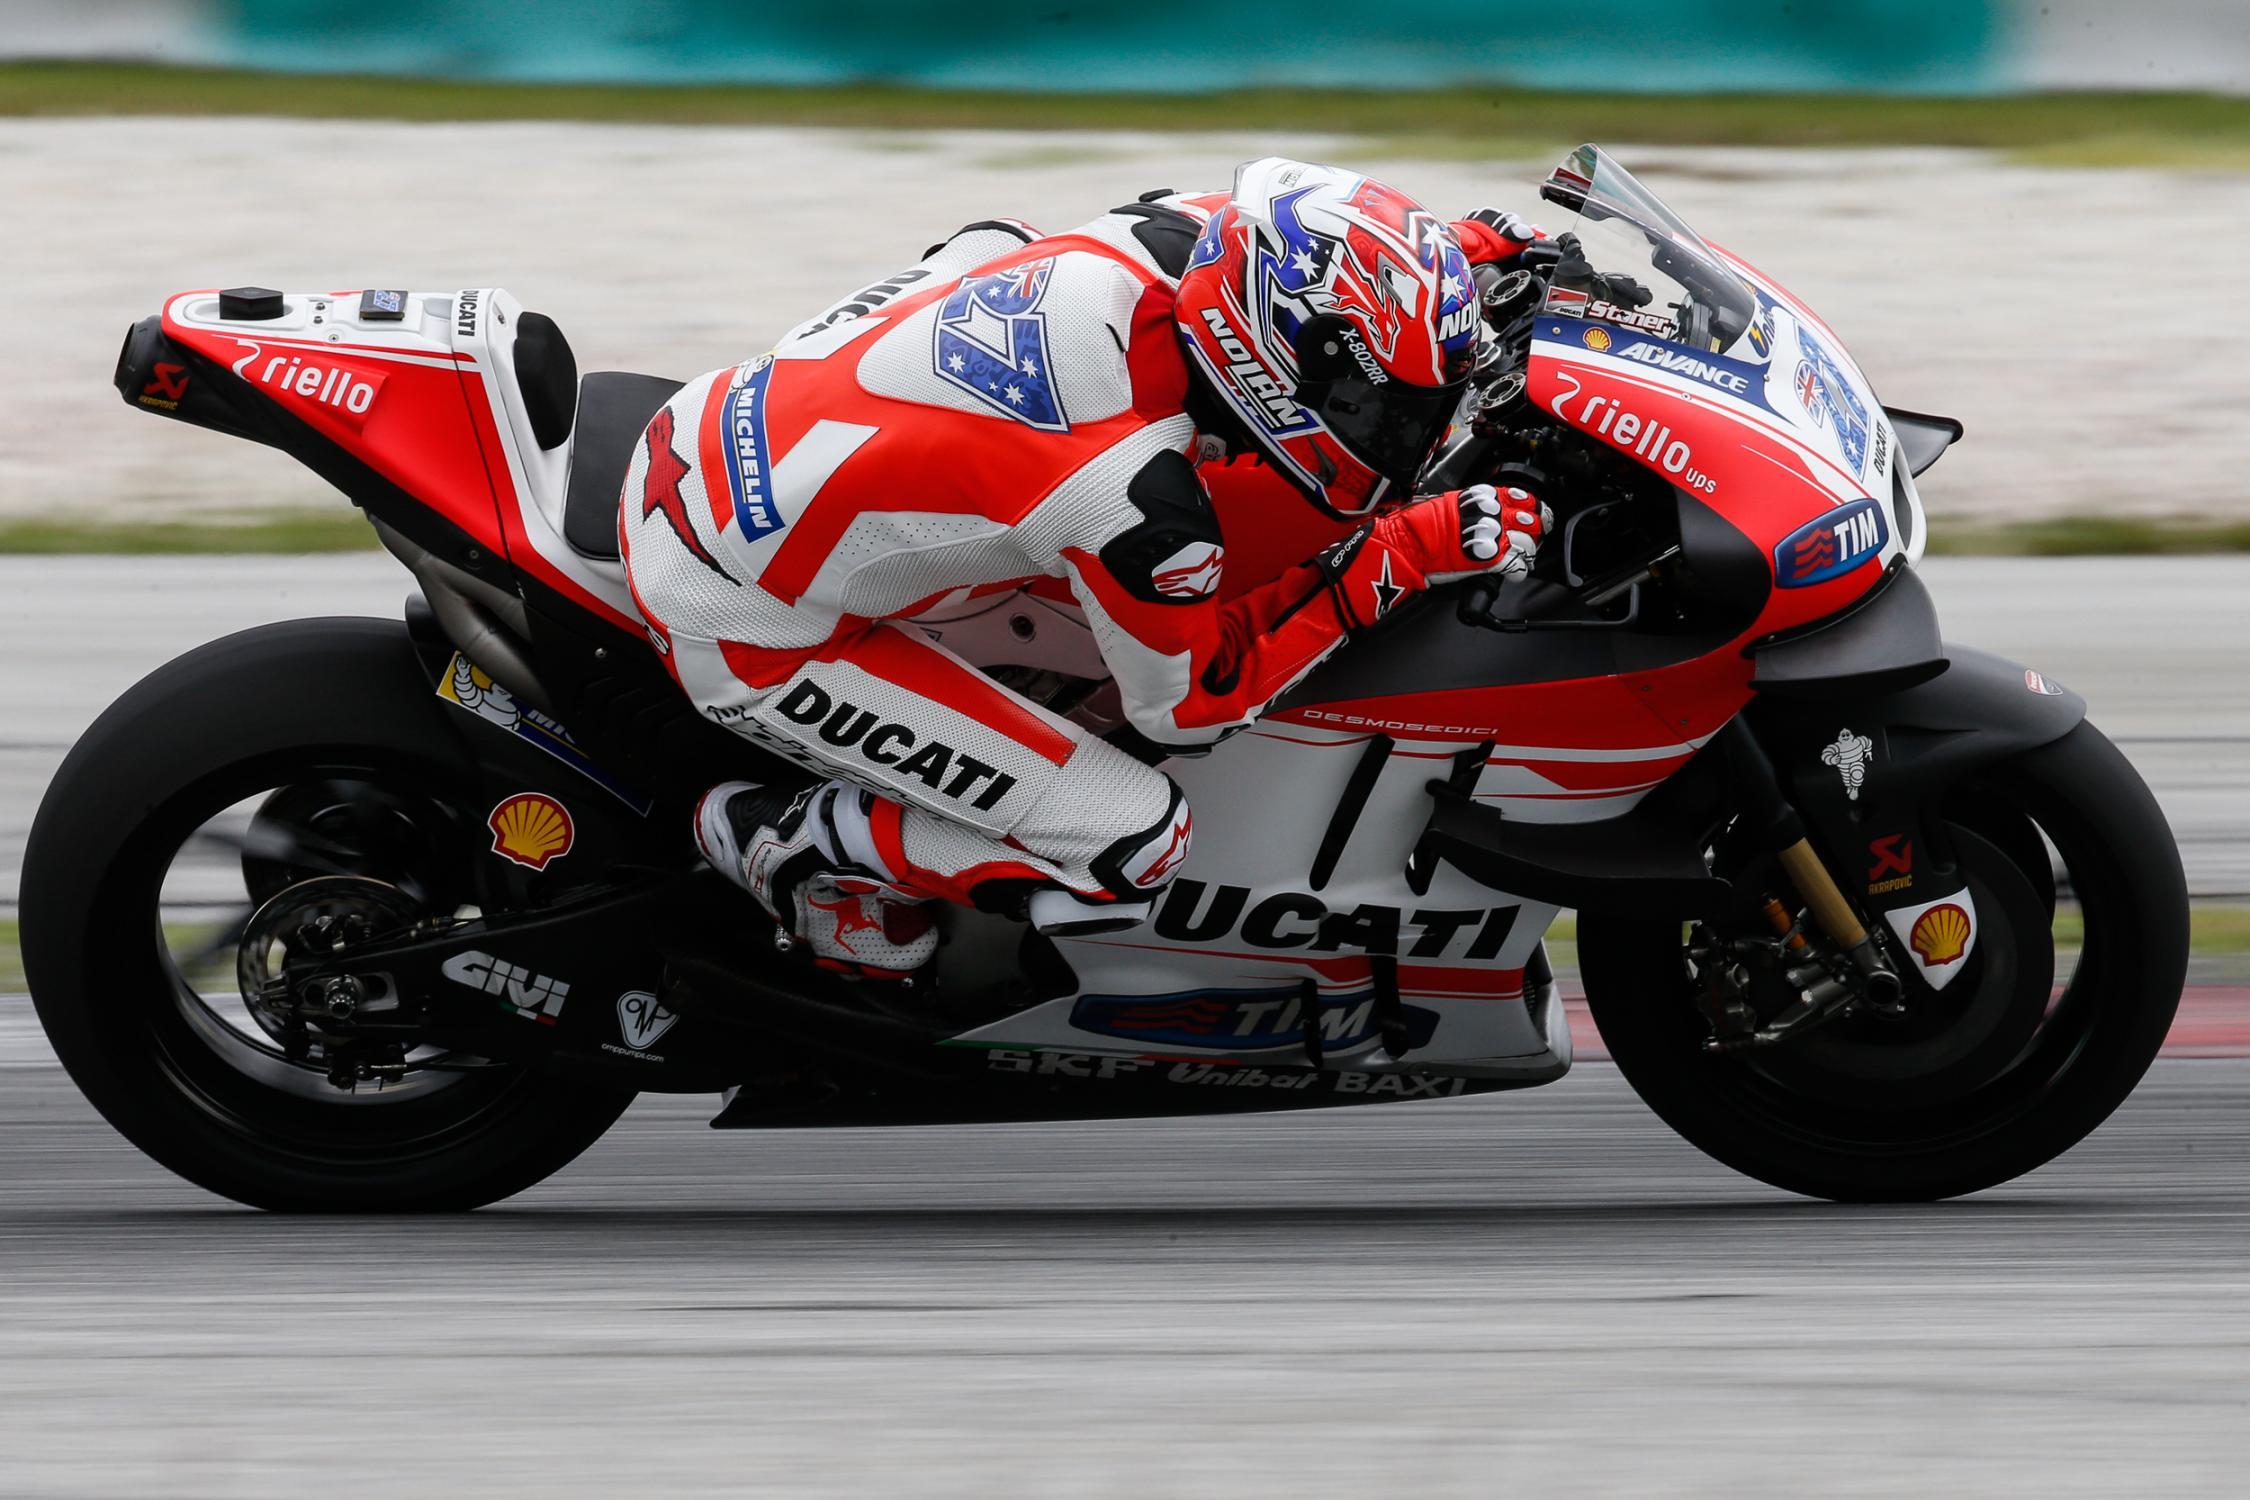 Test MotoGP Sepang 2016 - Page 2 27-casey-stoner__gp_7710.gallery_full_top_fullscreen